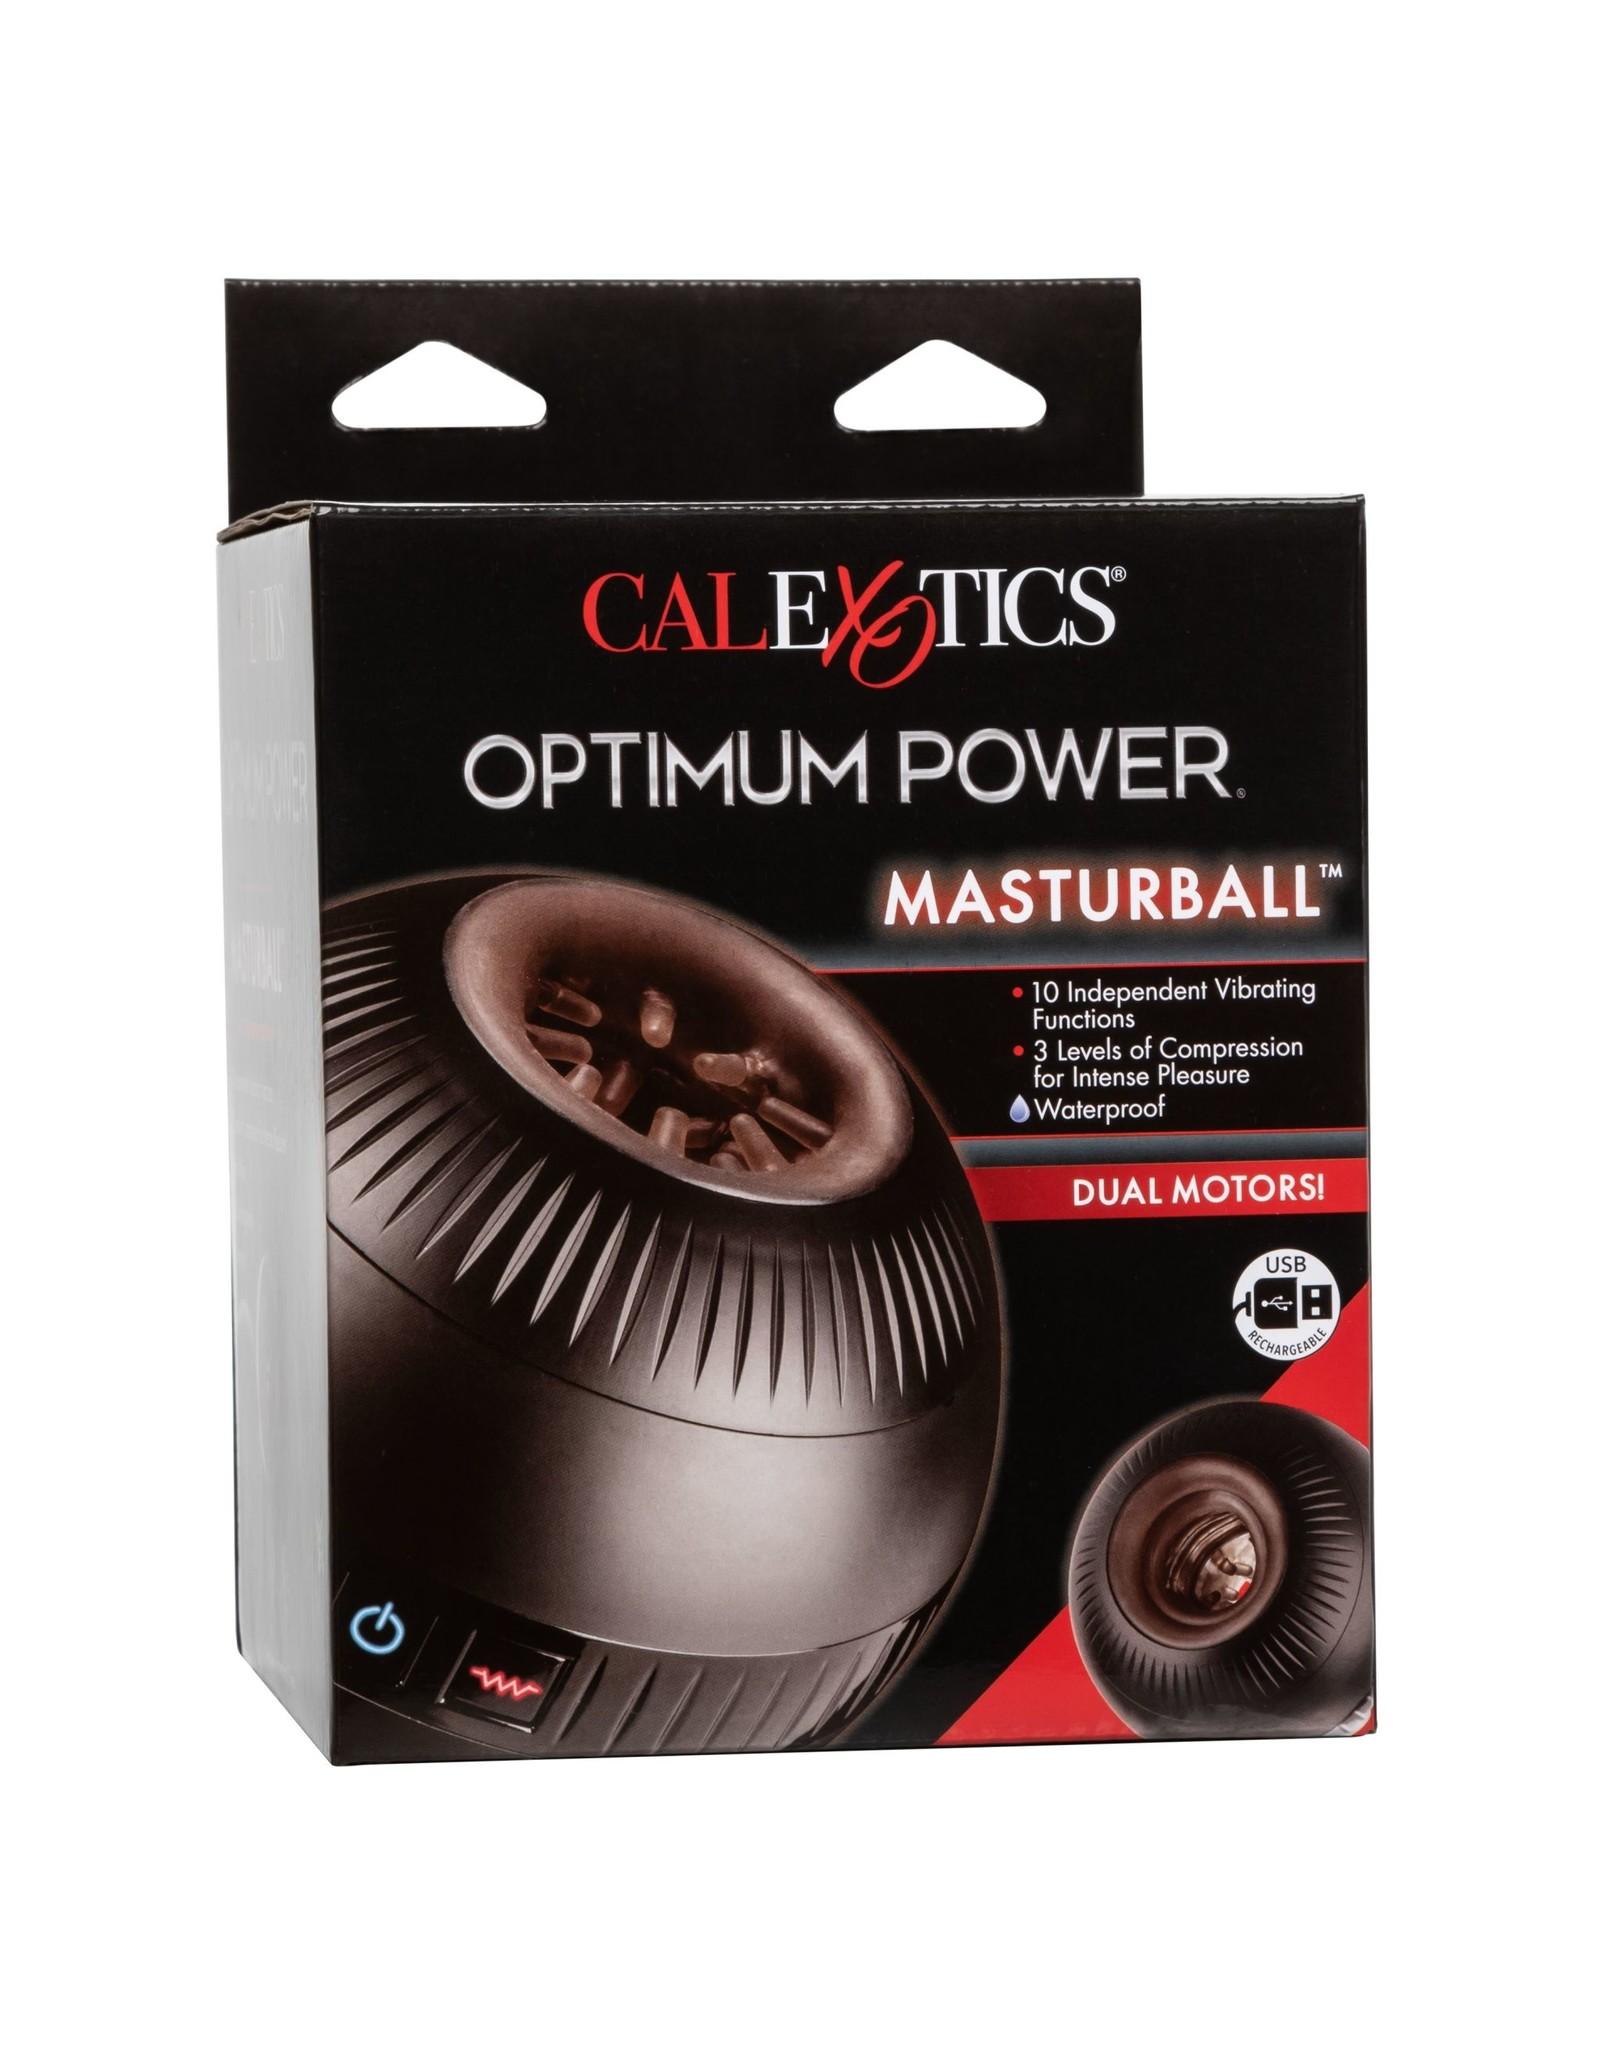 CALEXOTICS - OPTIMUM POWER - MASTURBALL